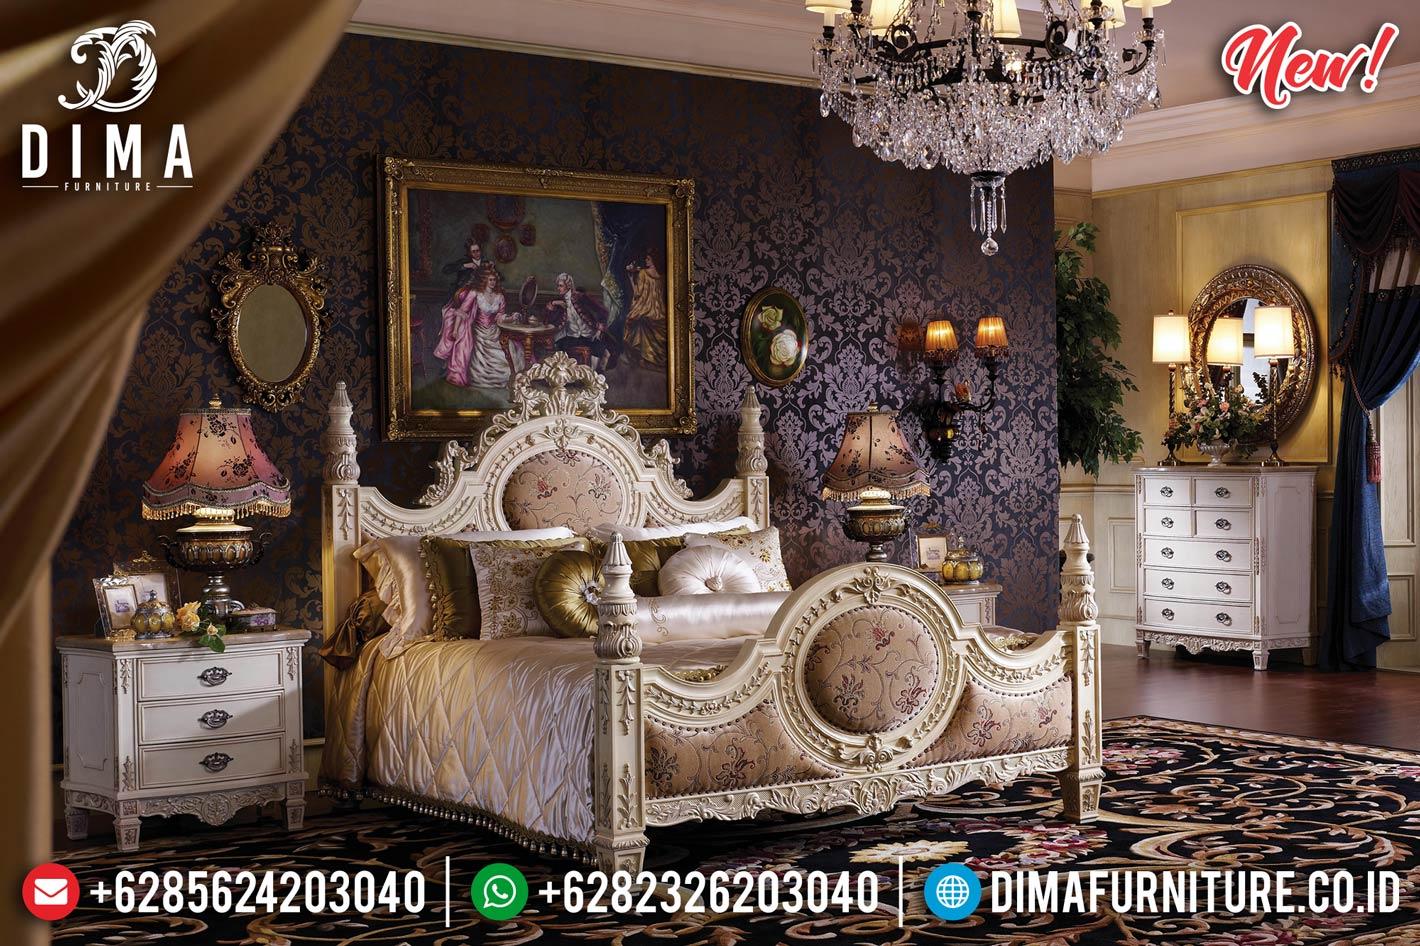 Baroque Kamar Set Ukiran Mewah Luxury Classic Best Product Furniture Jepara BT-0935